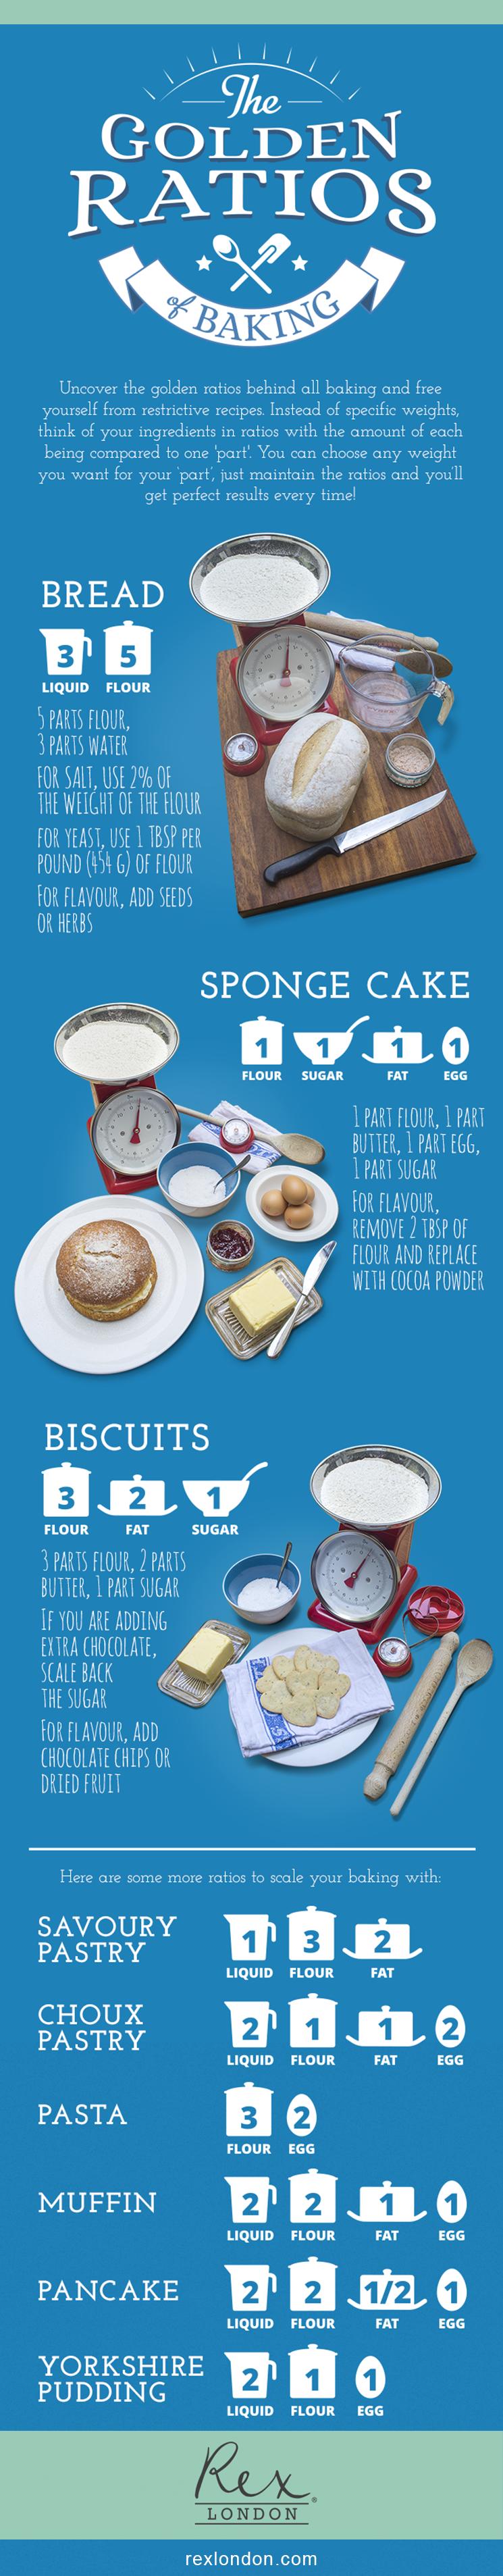 Rex London ratios of baking infographic